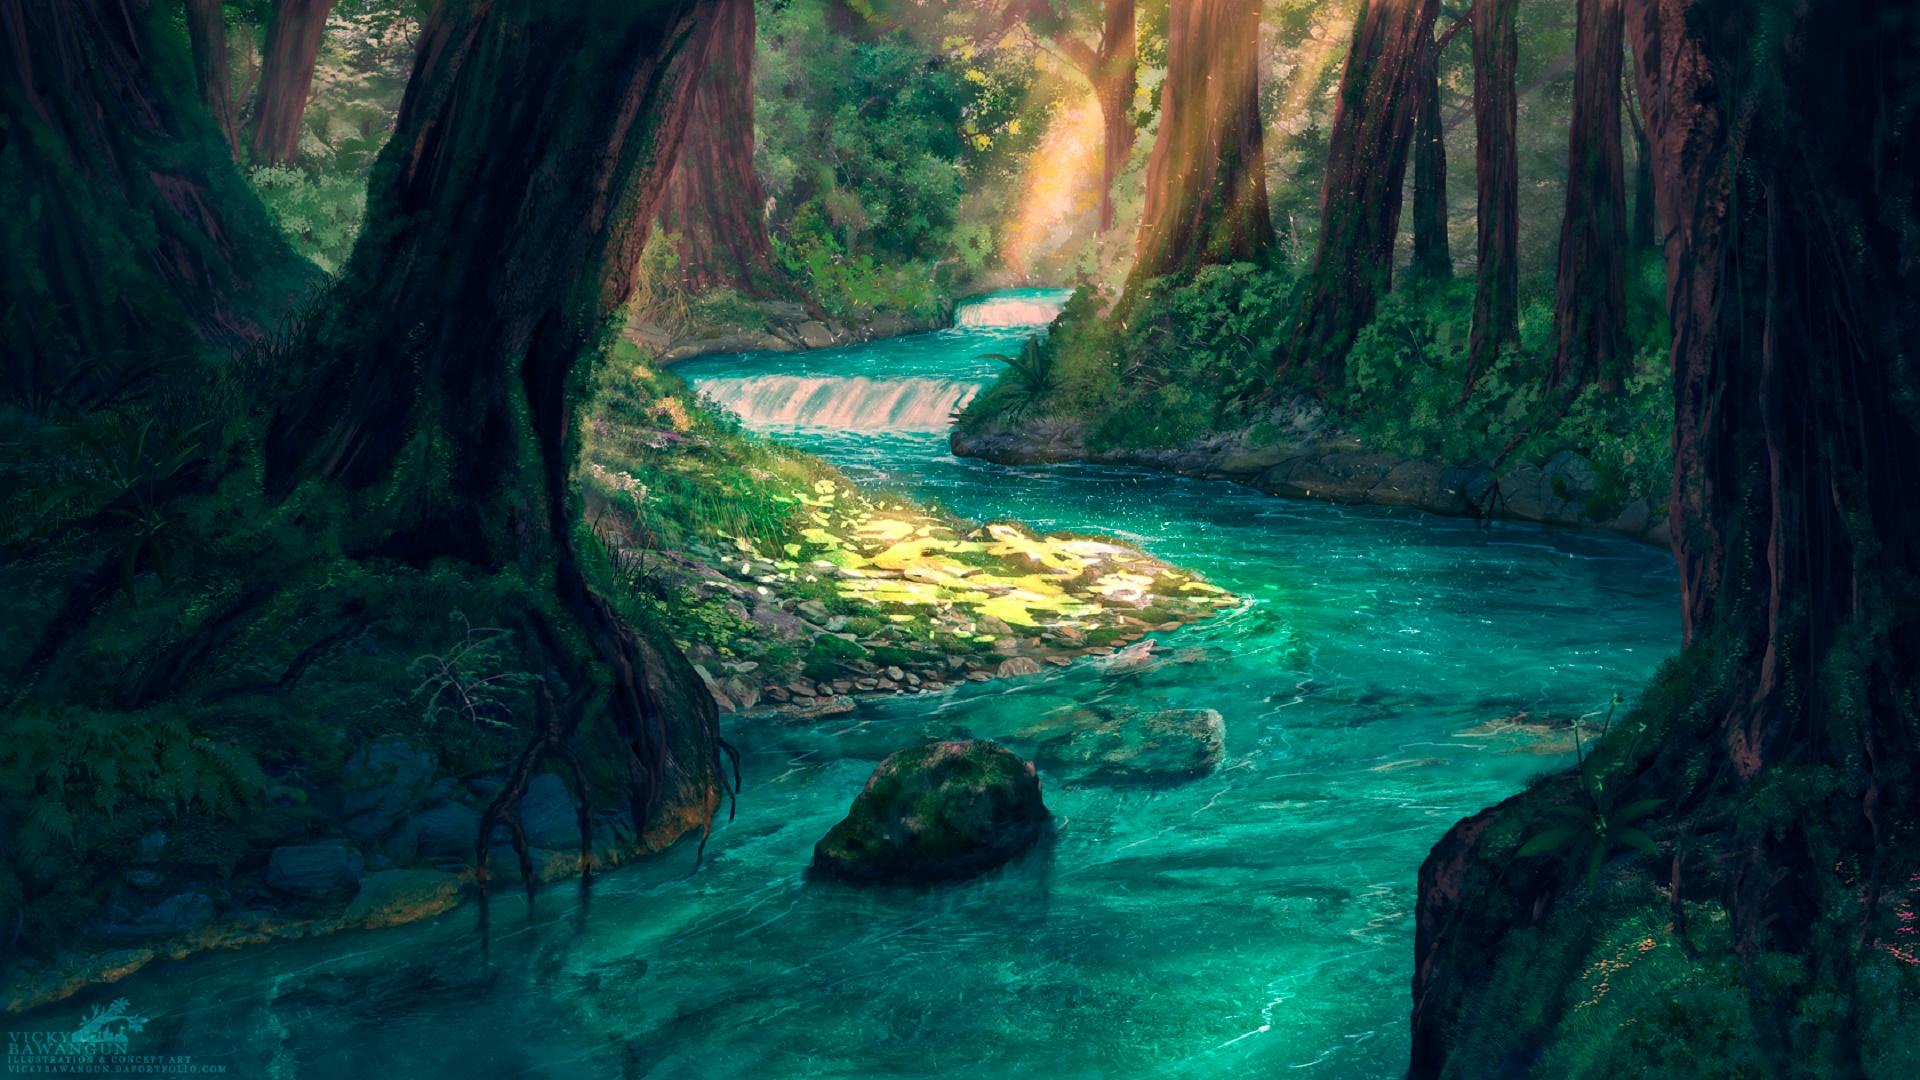 Forest River Wallpaper Engine